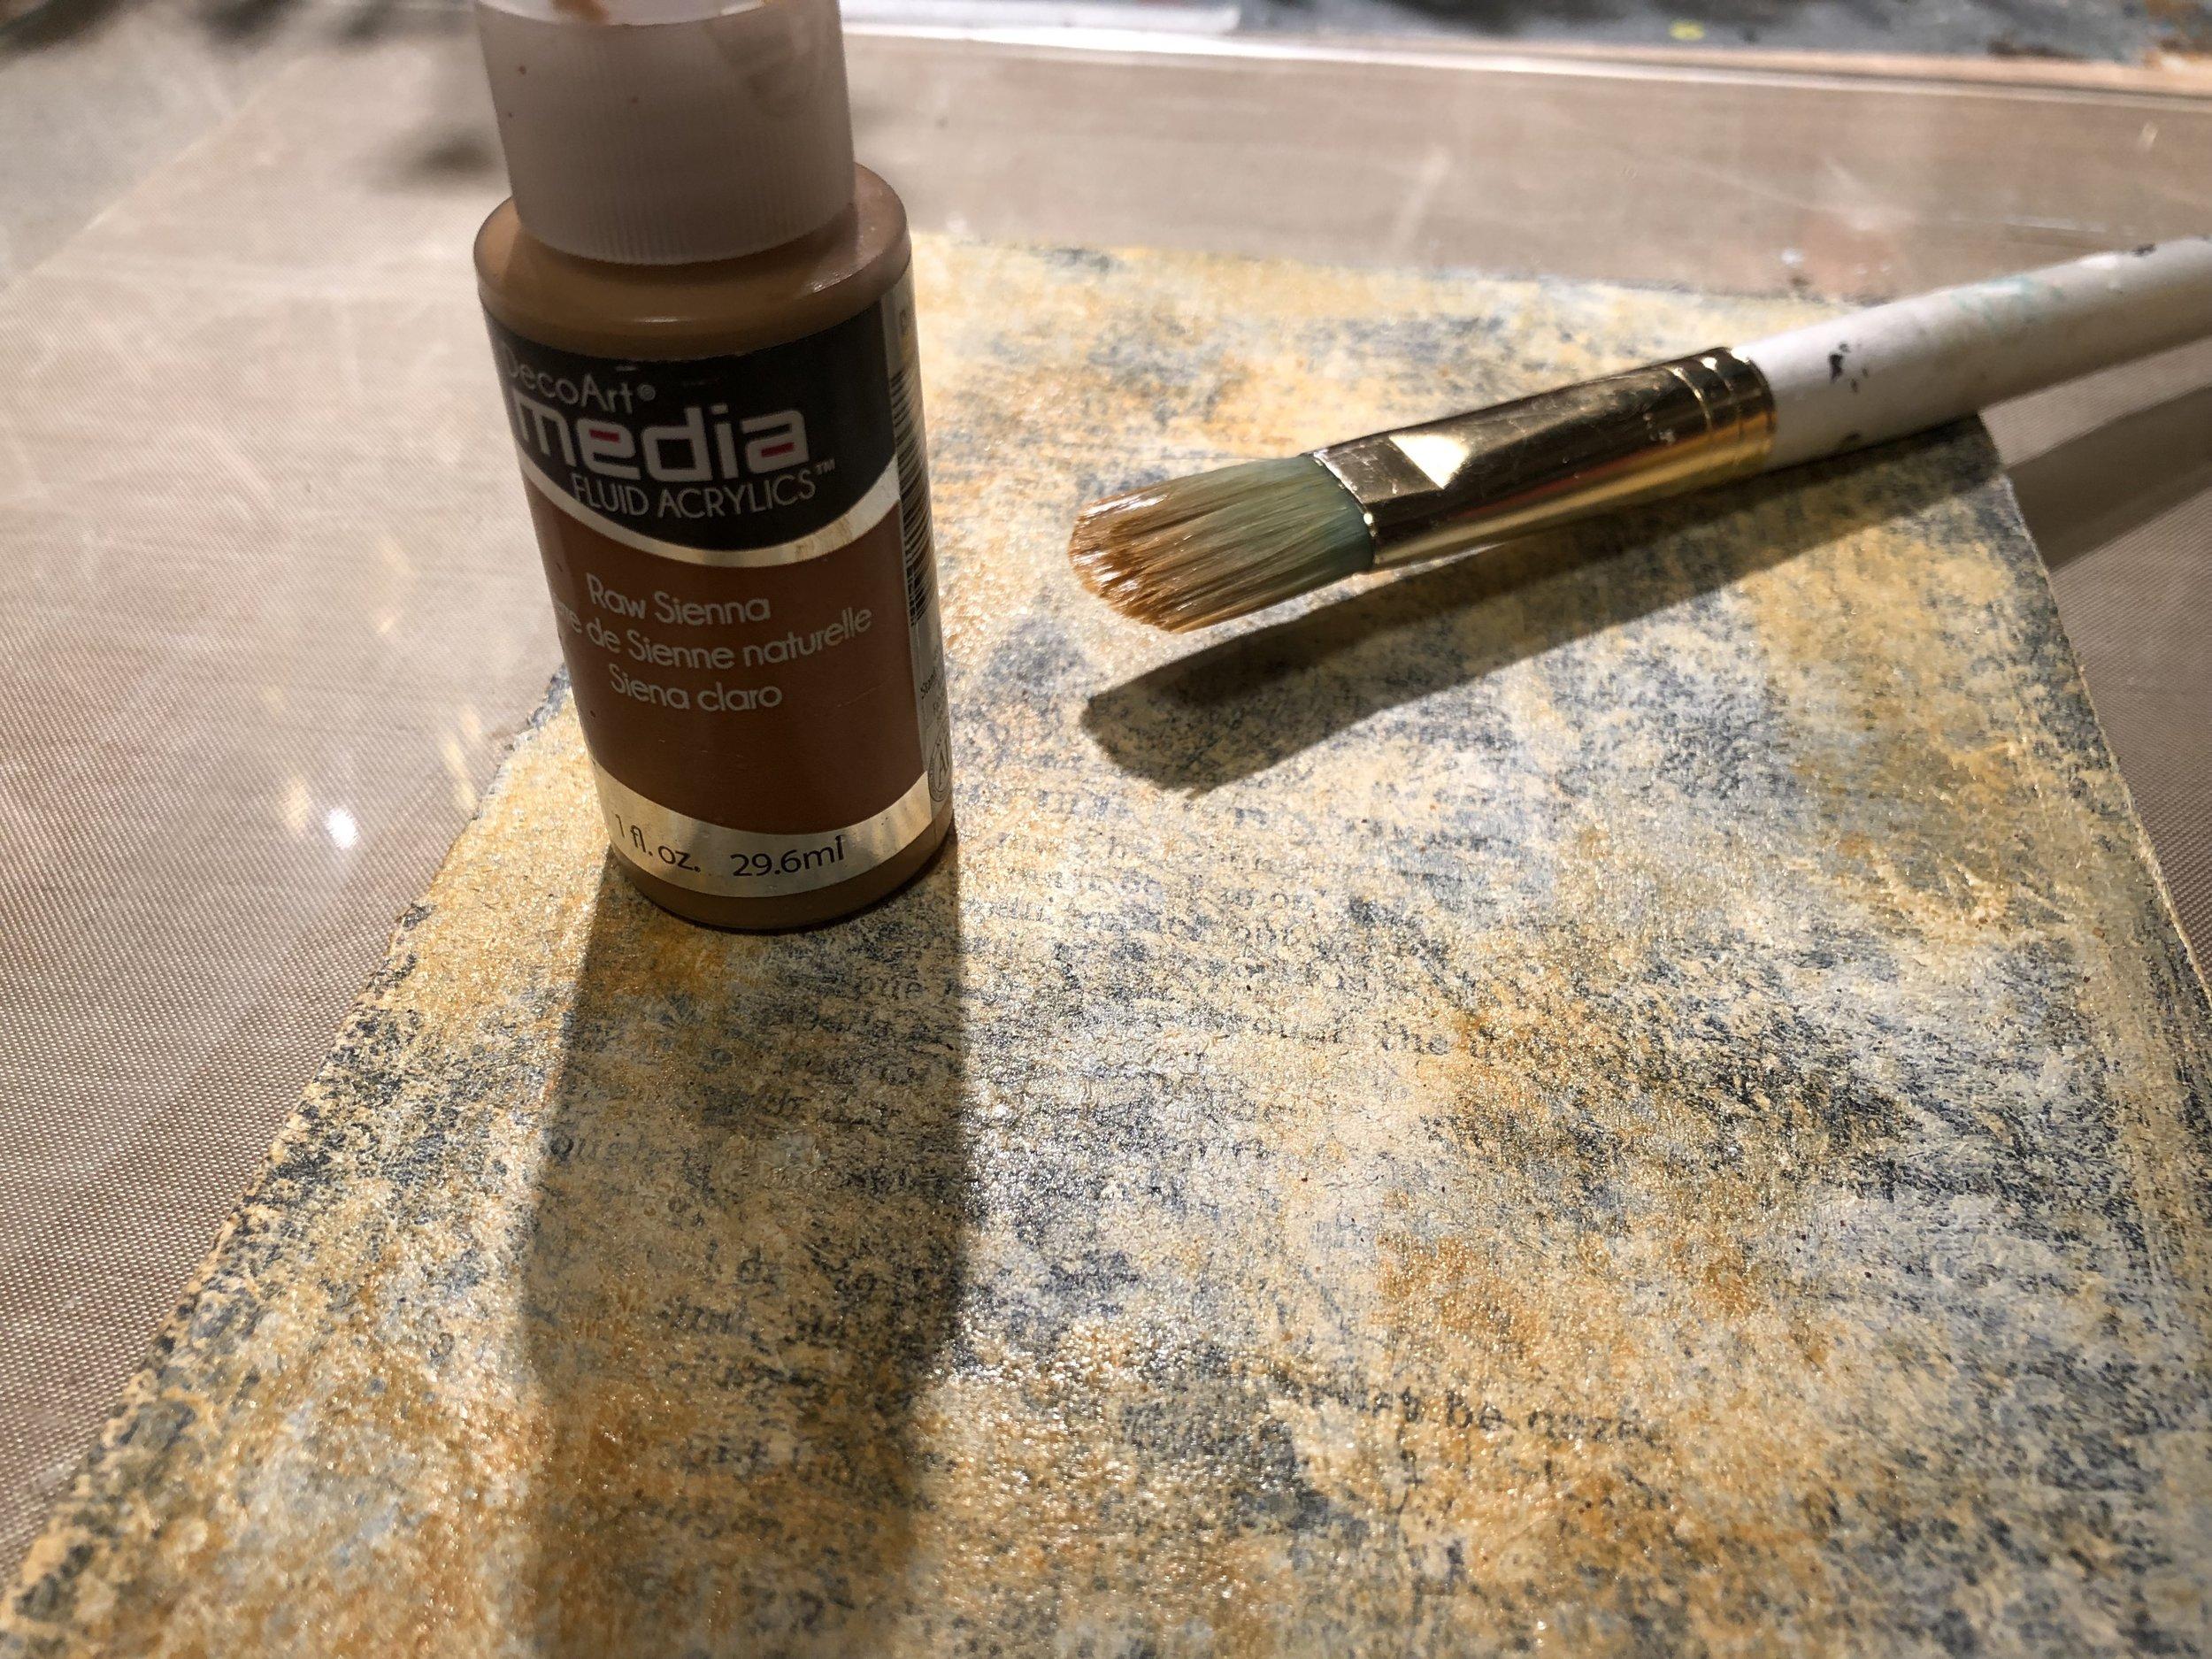 Brush a light layer of DecoArt Media Fluid Acrylic in Raw Sienna.